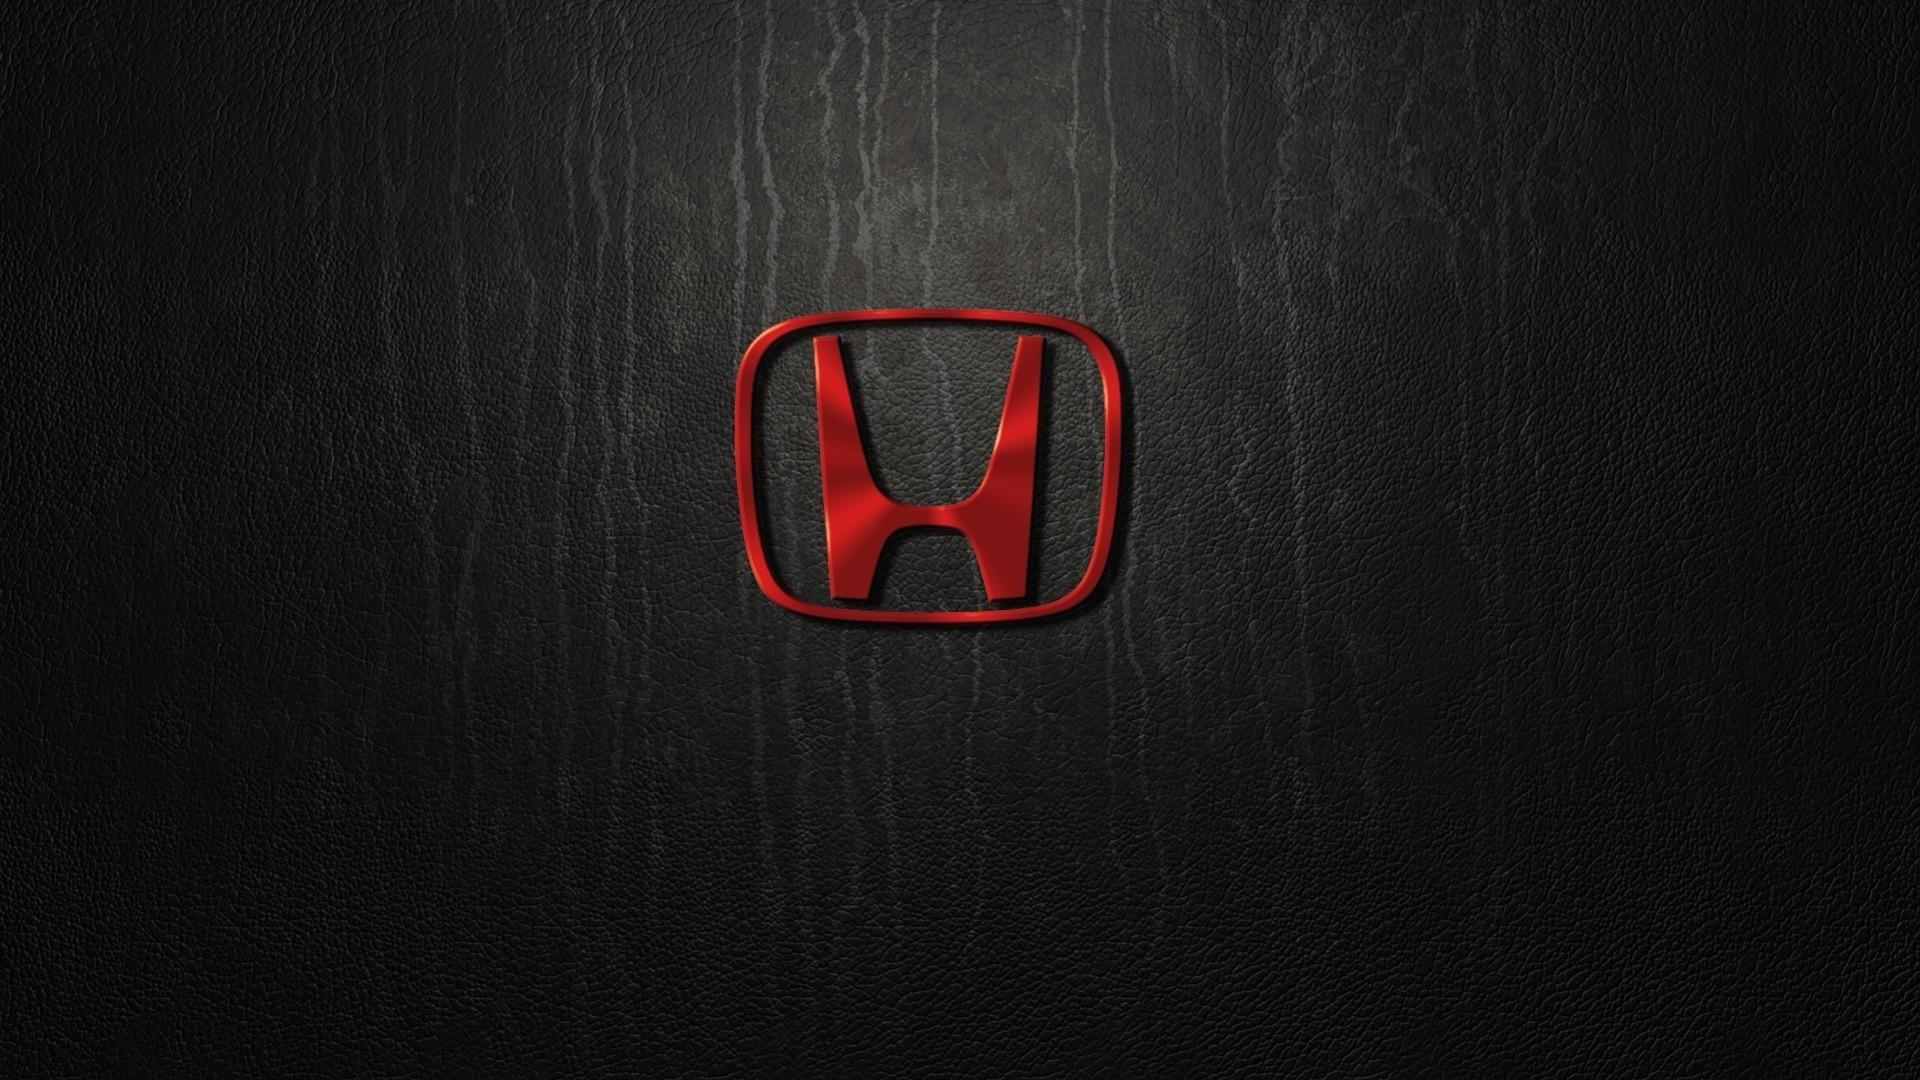 honda logo wallpaper 53 images